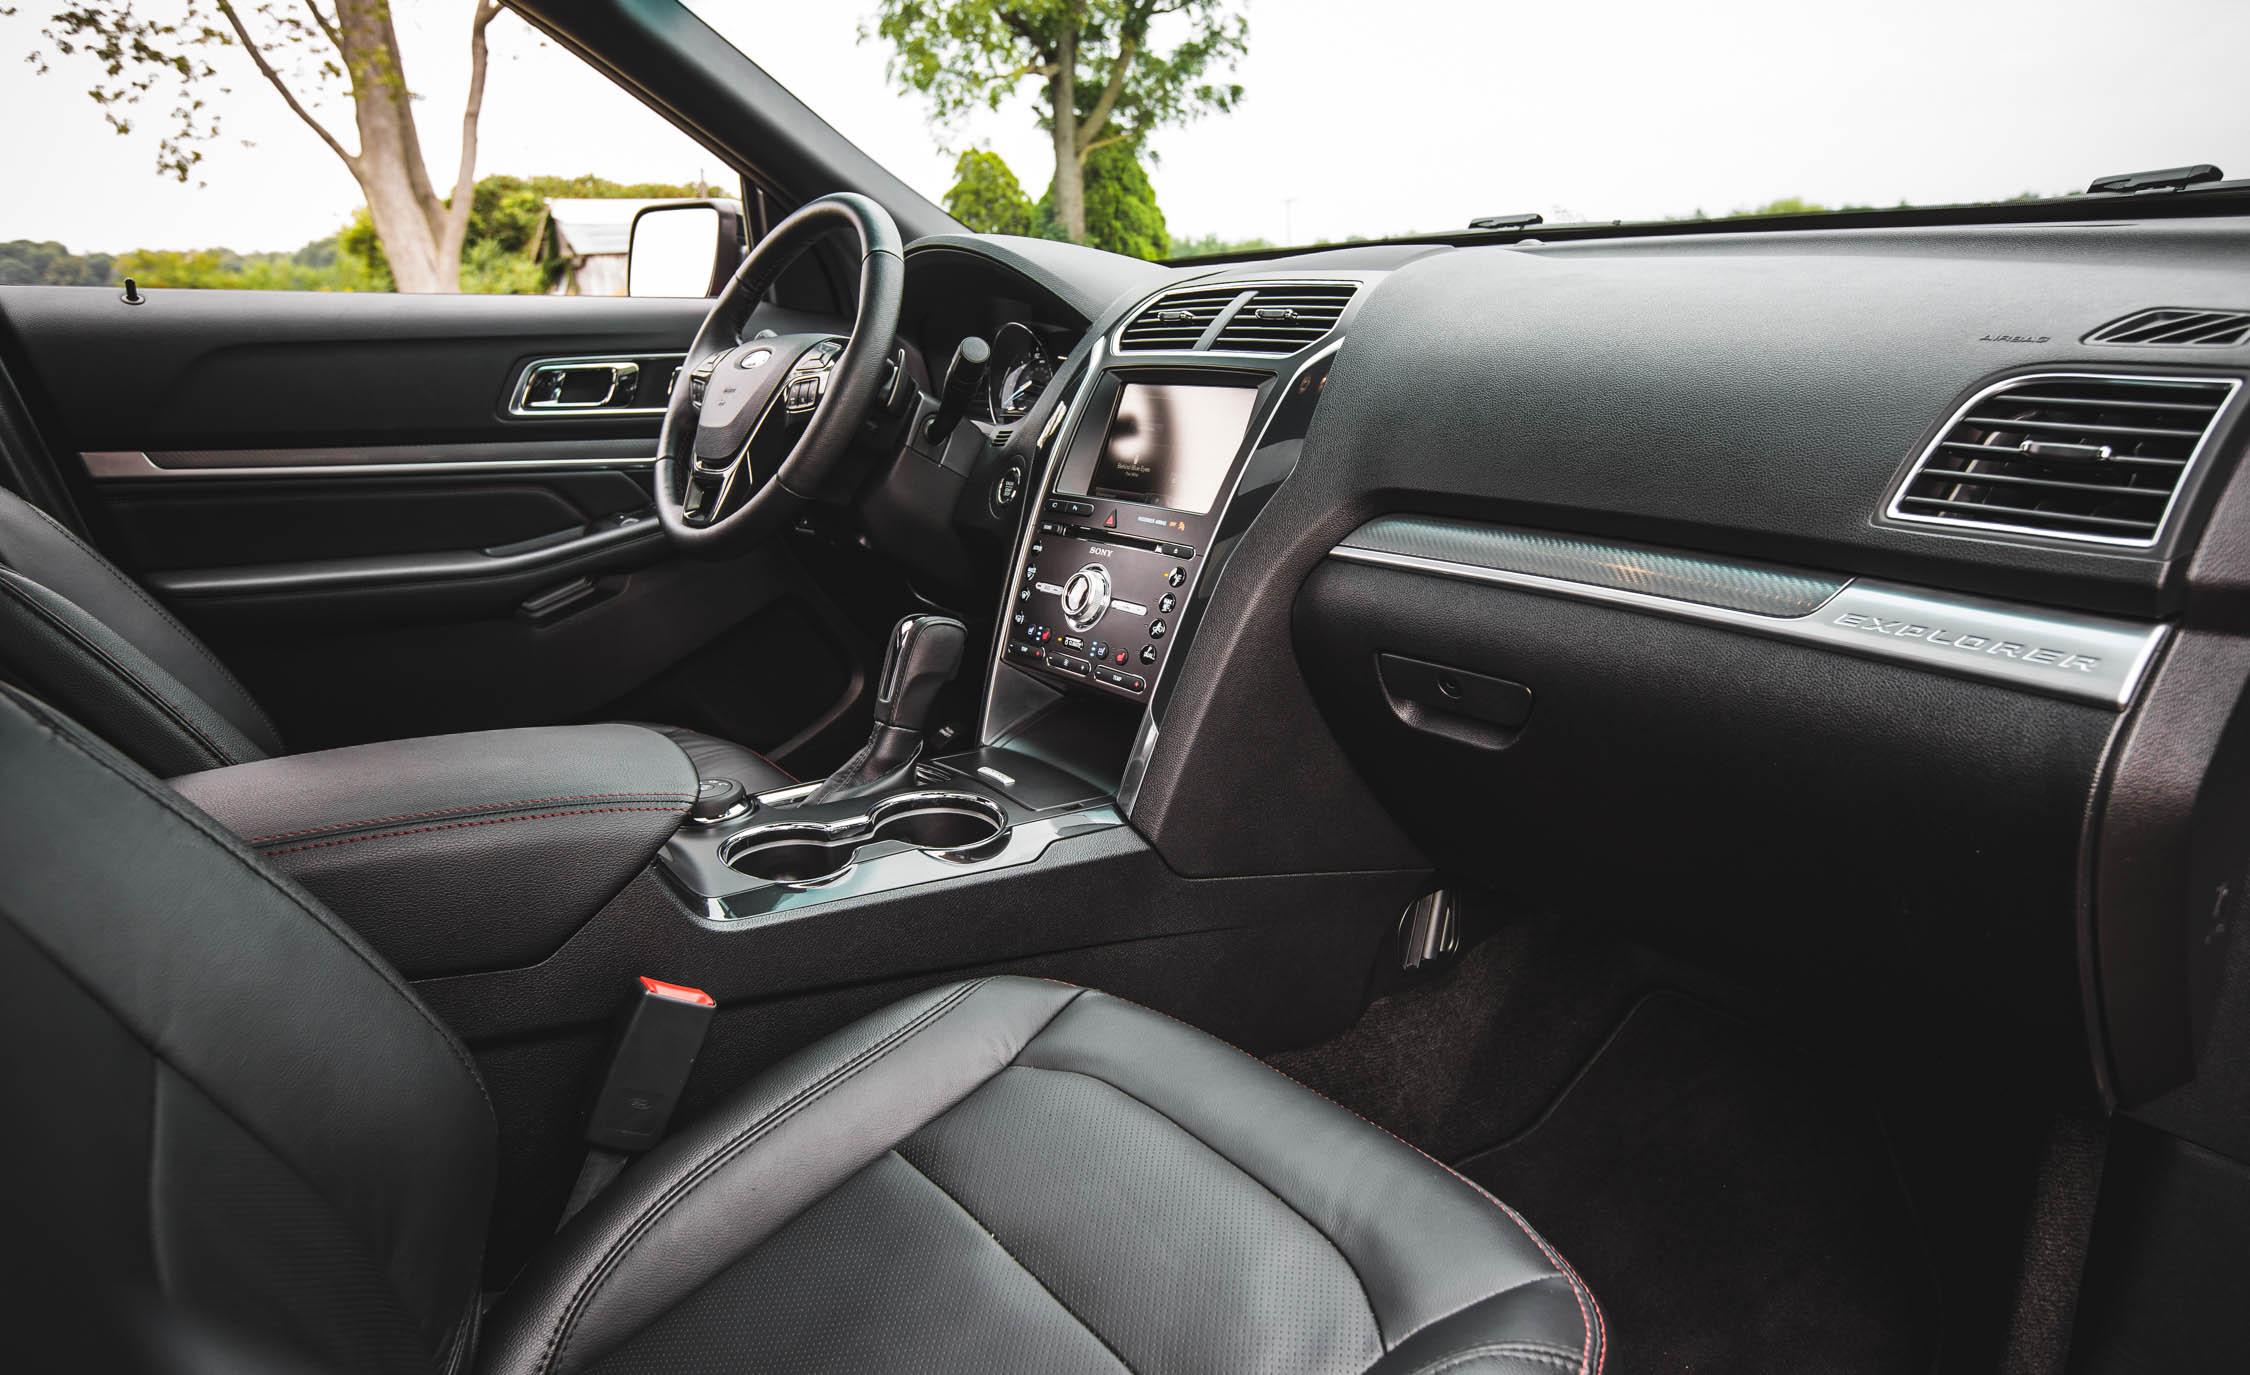 2016 Ford Explorer Sport Interior Front